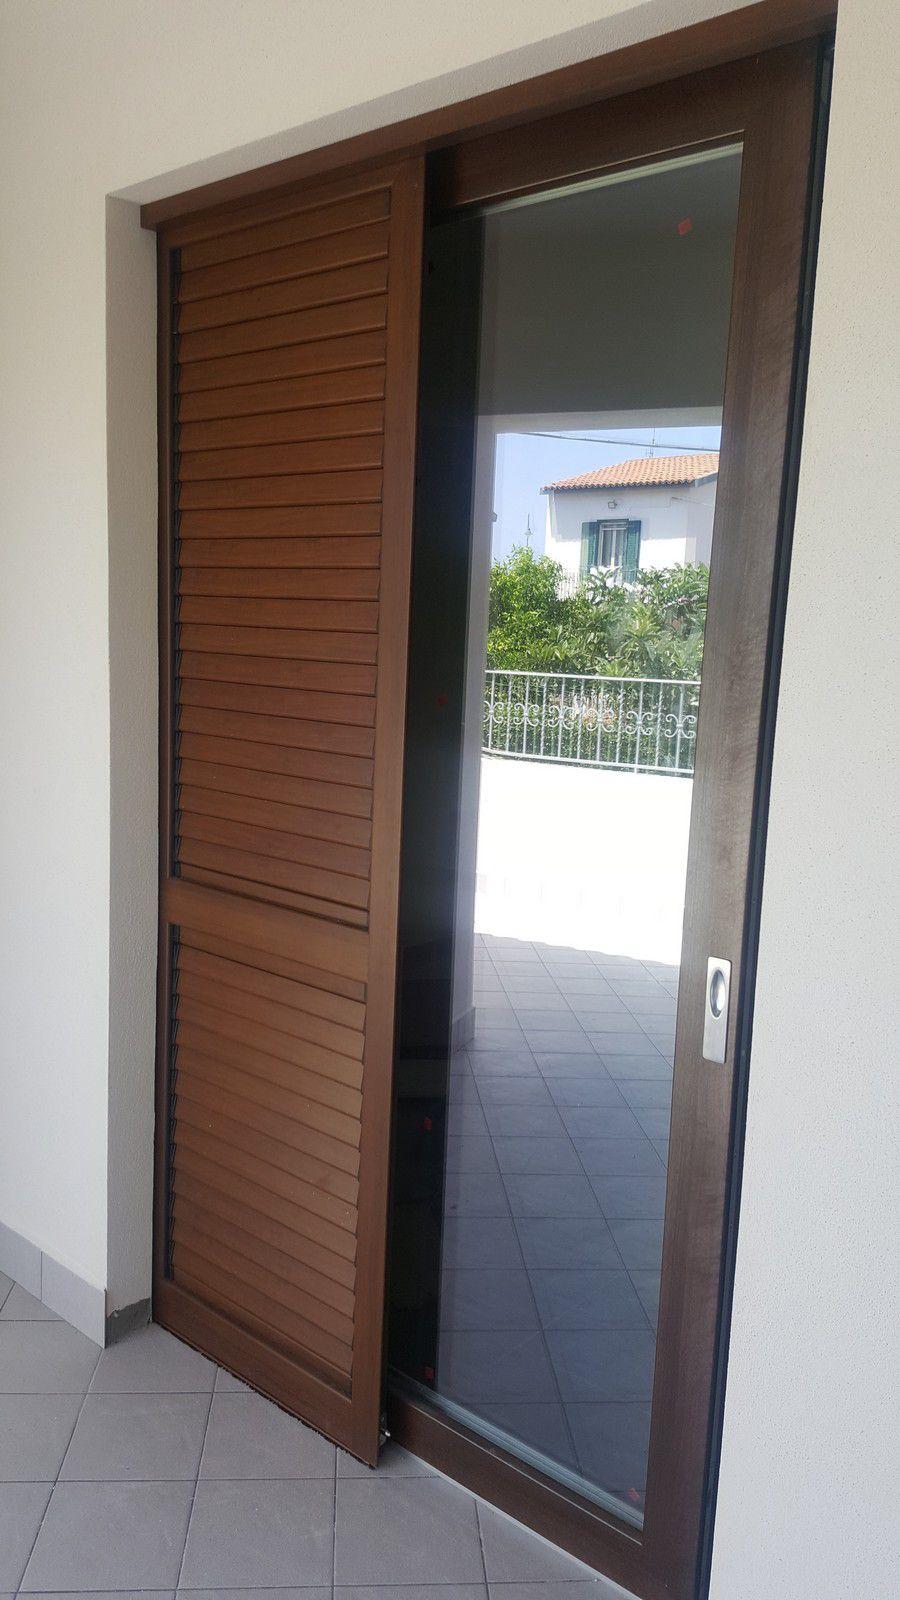 Cannistr infissi vendita finestre e infissi pvc in messina - Vendita finestre pvc ...